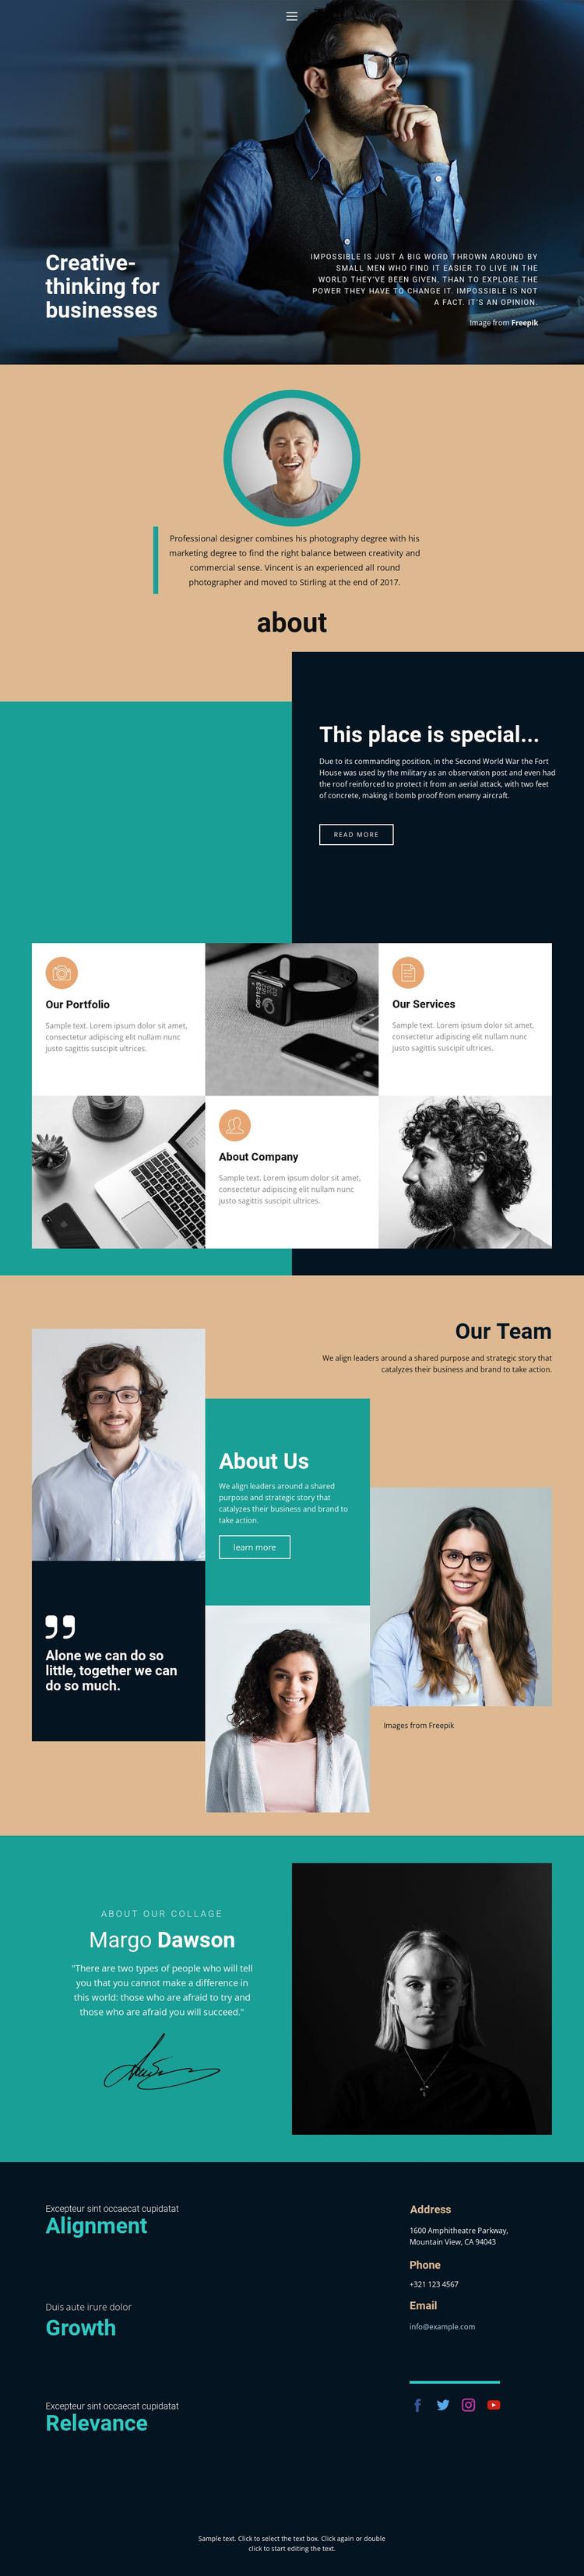 Creative growing business Web Design